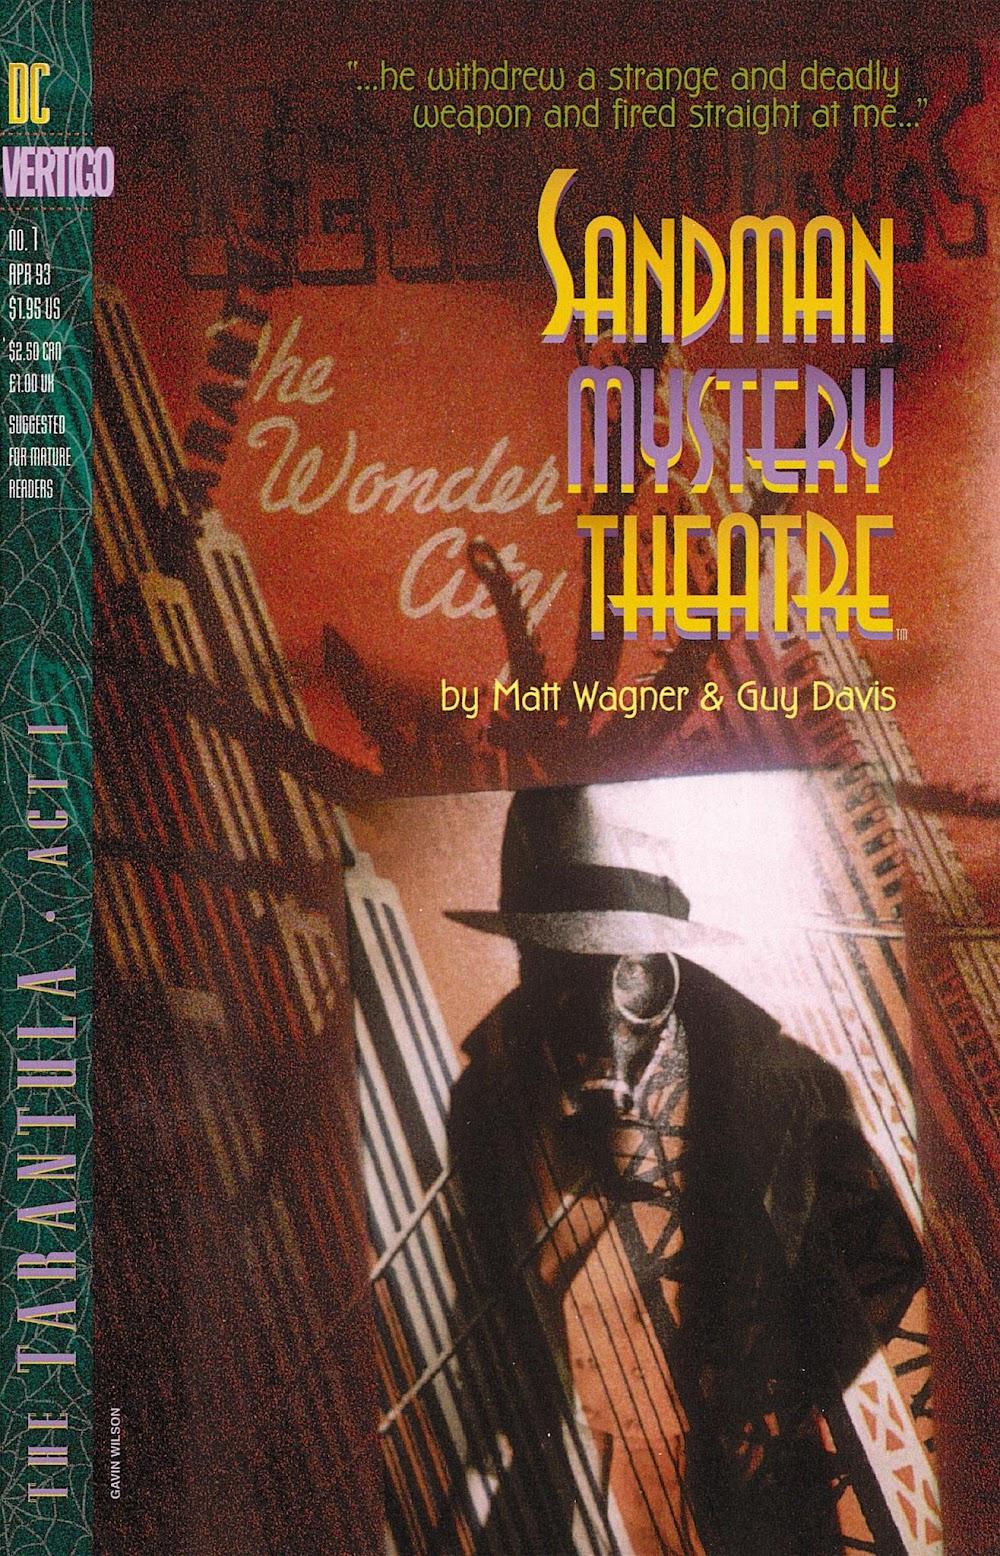 Sandman Mystery Theatre (1993) - complete